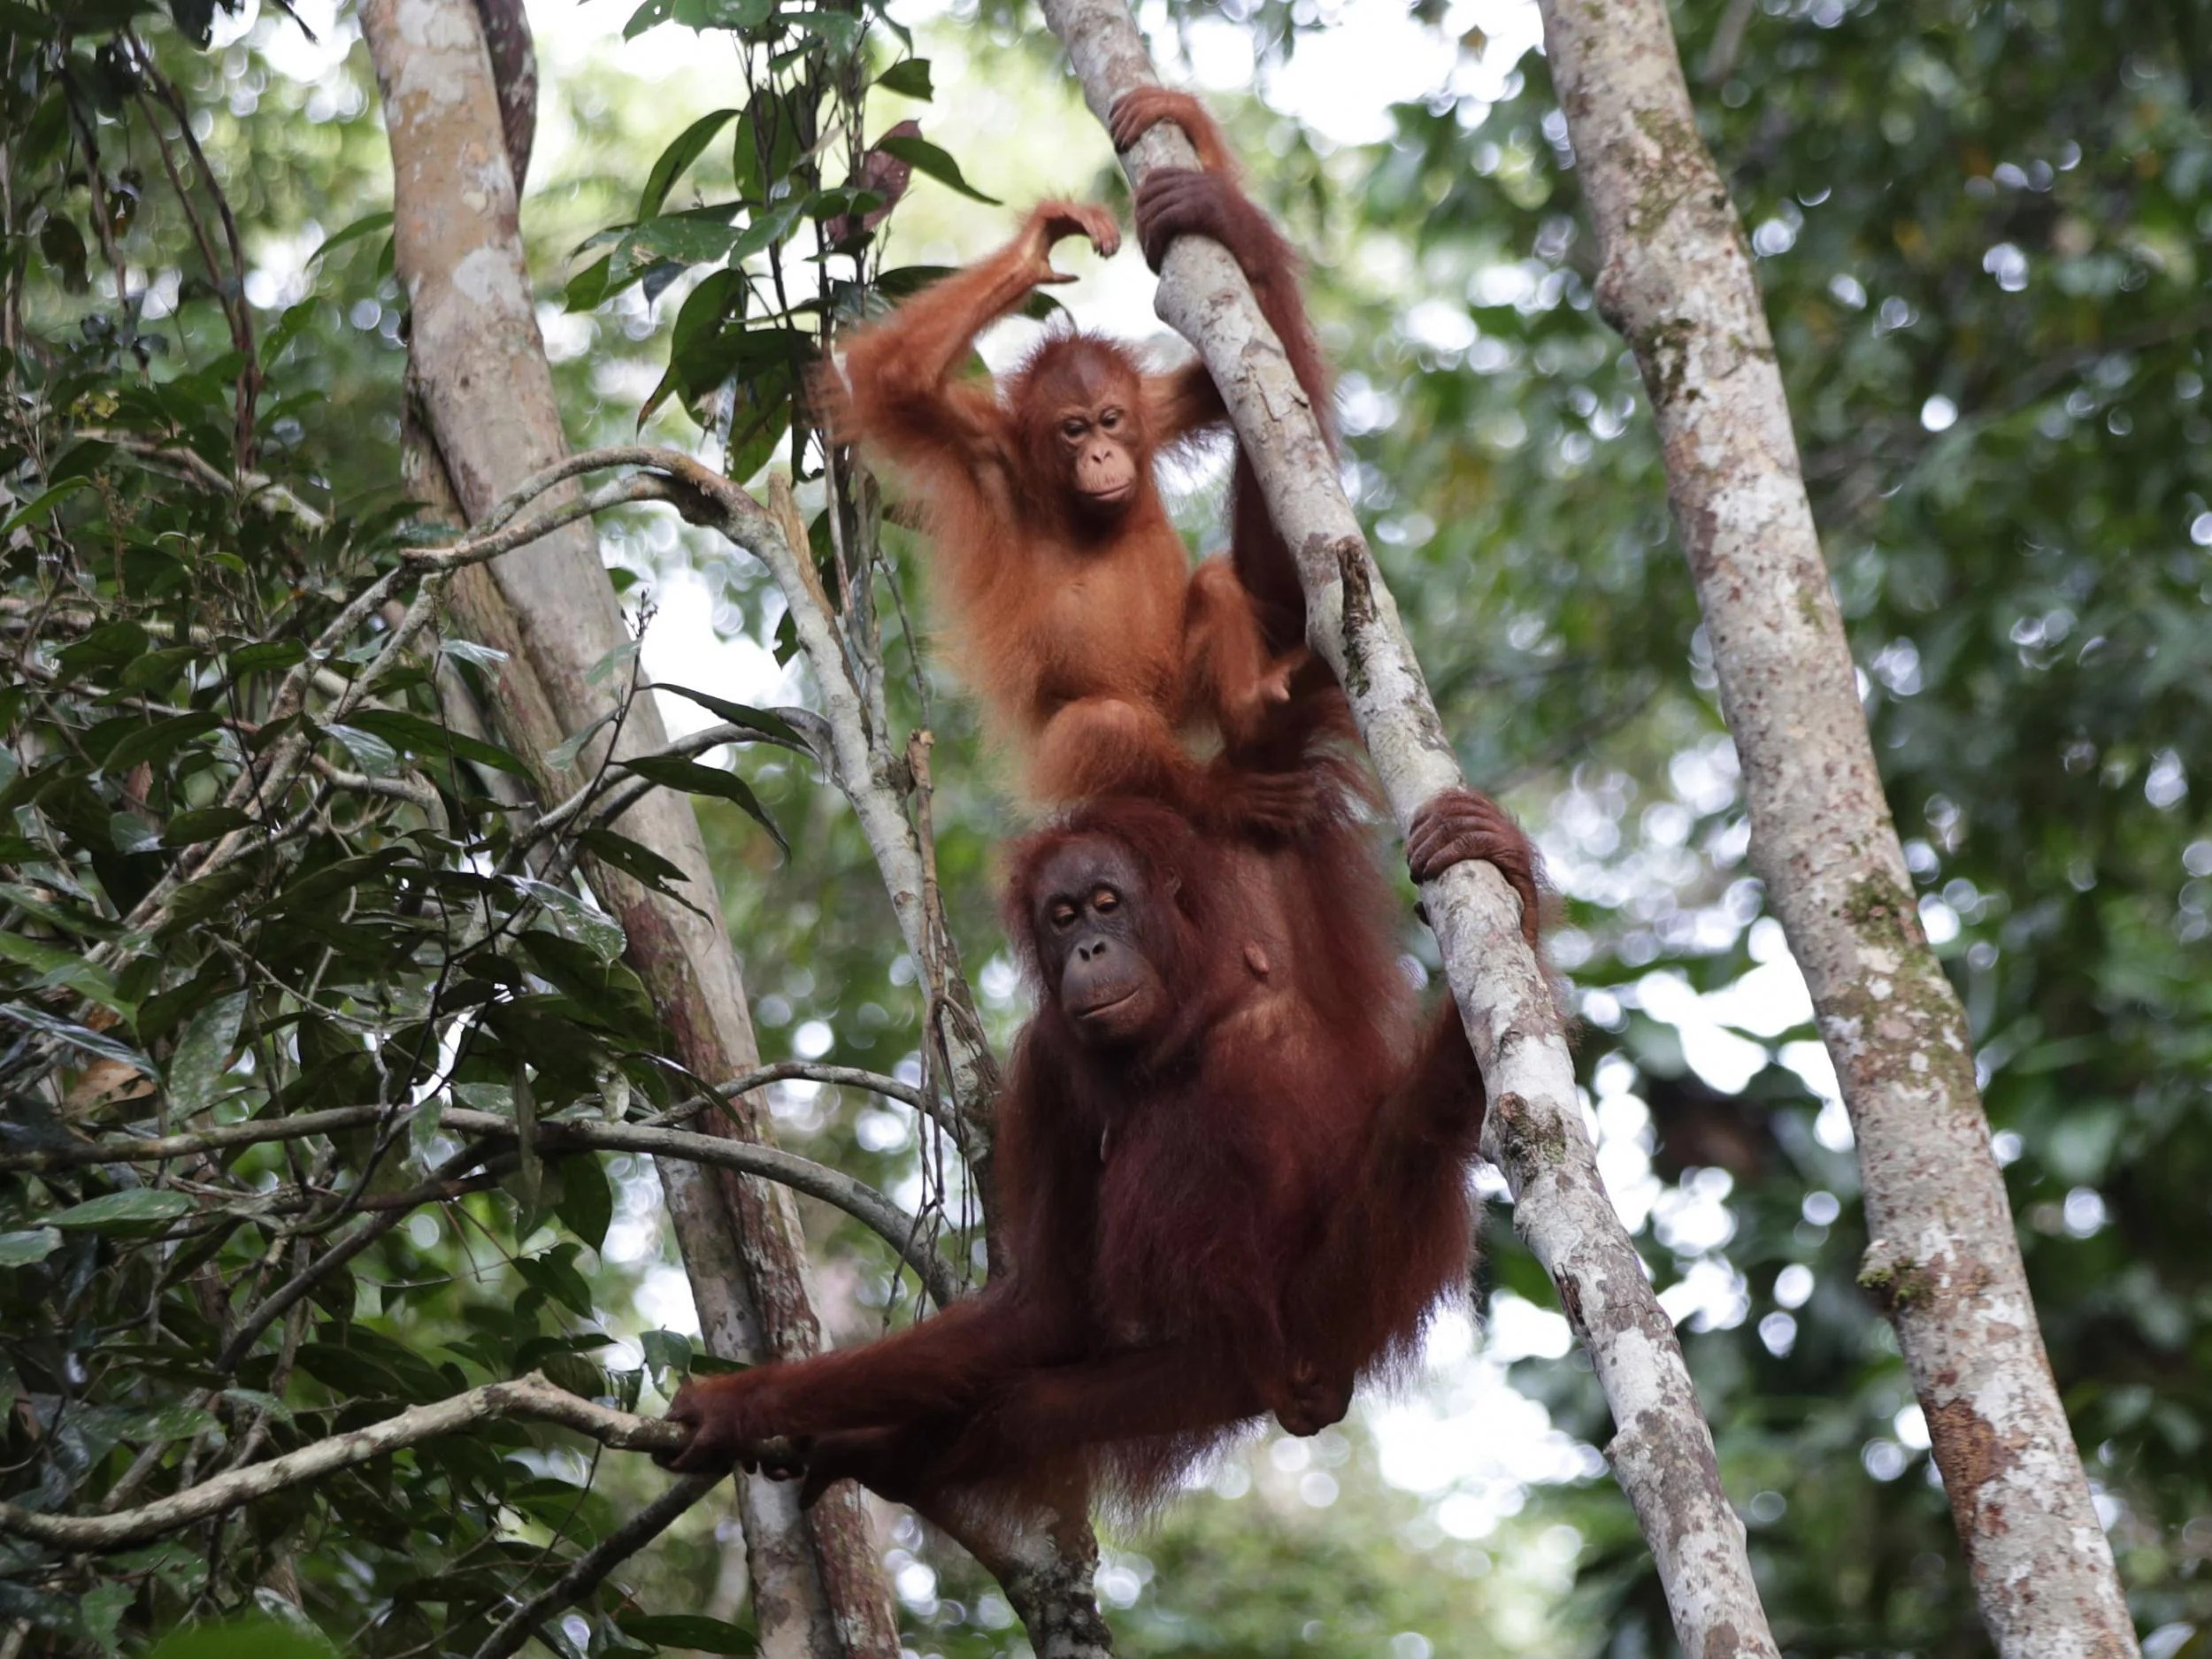 Borneo S Last Remaining Orangutans Threatened By Illegal Logging Despite Government Protection